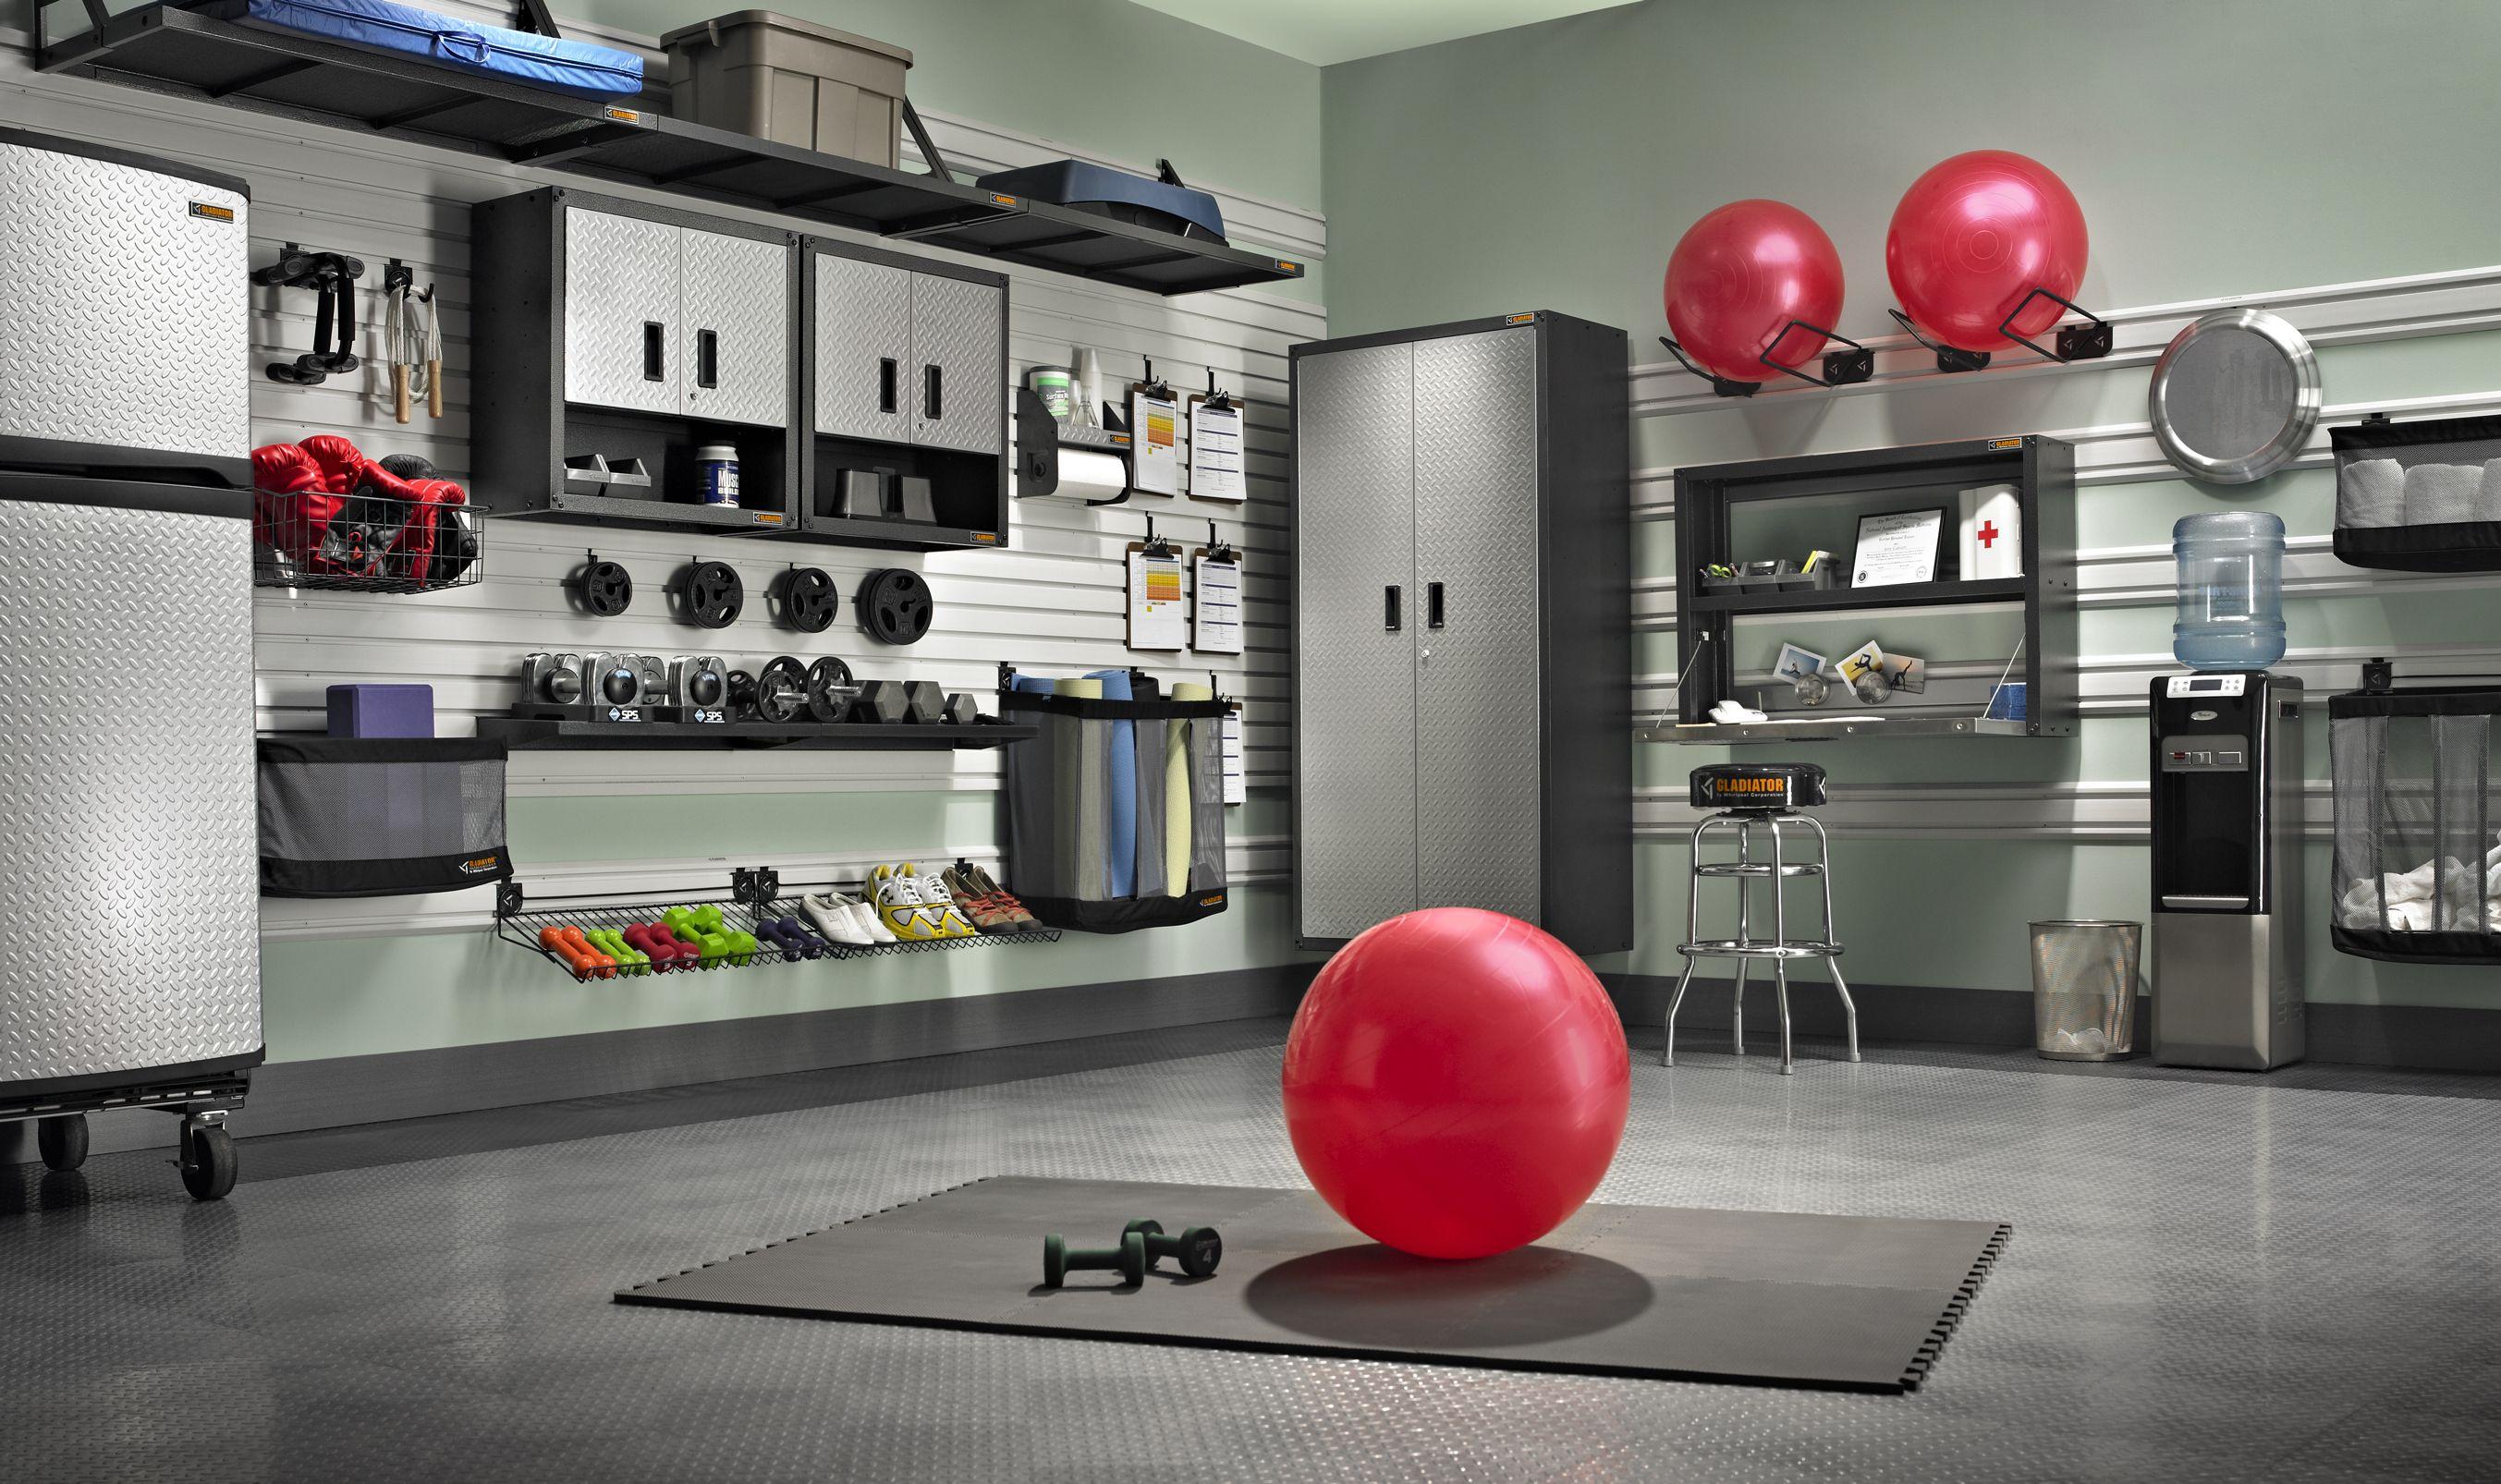 gladiator garageworks storage organization flooring and on best garage organization and storage hacks ideas start for organizing your garage id=38274